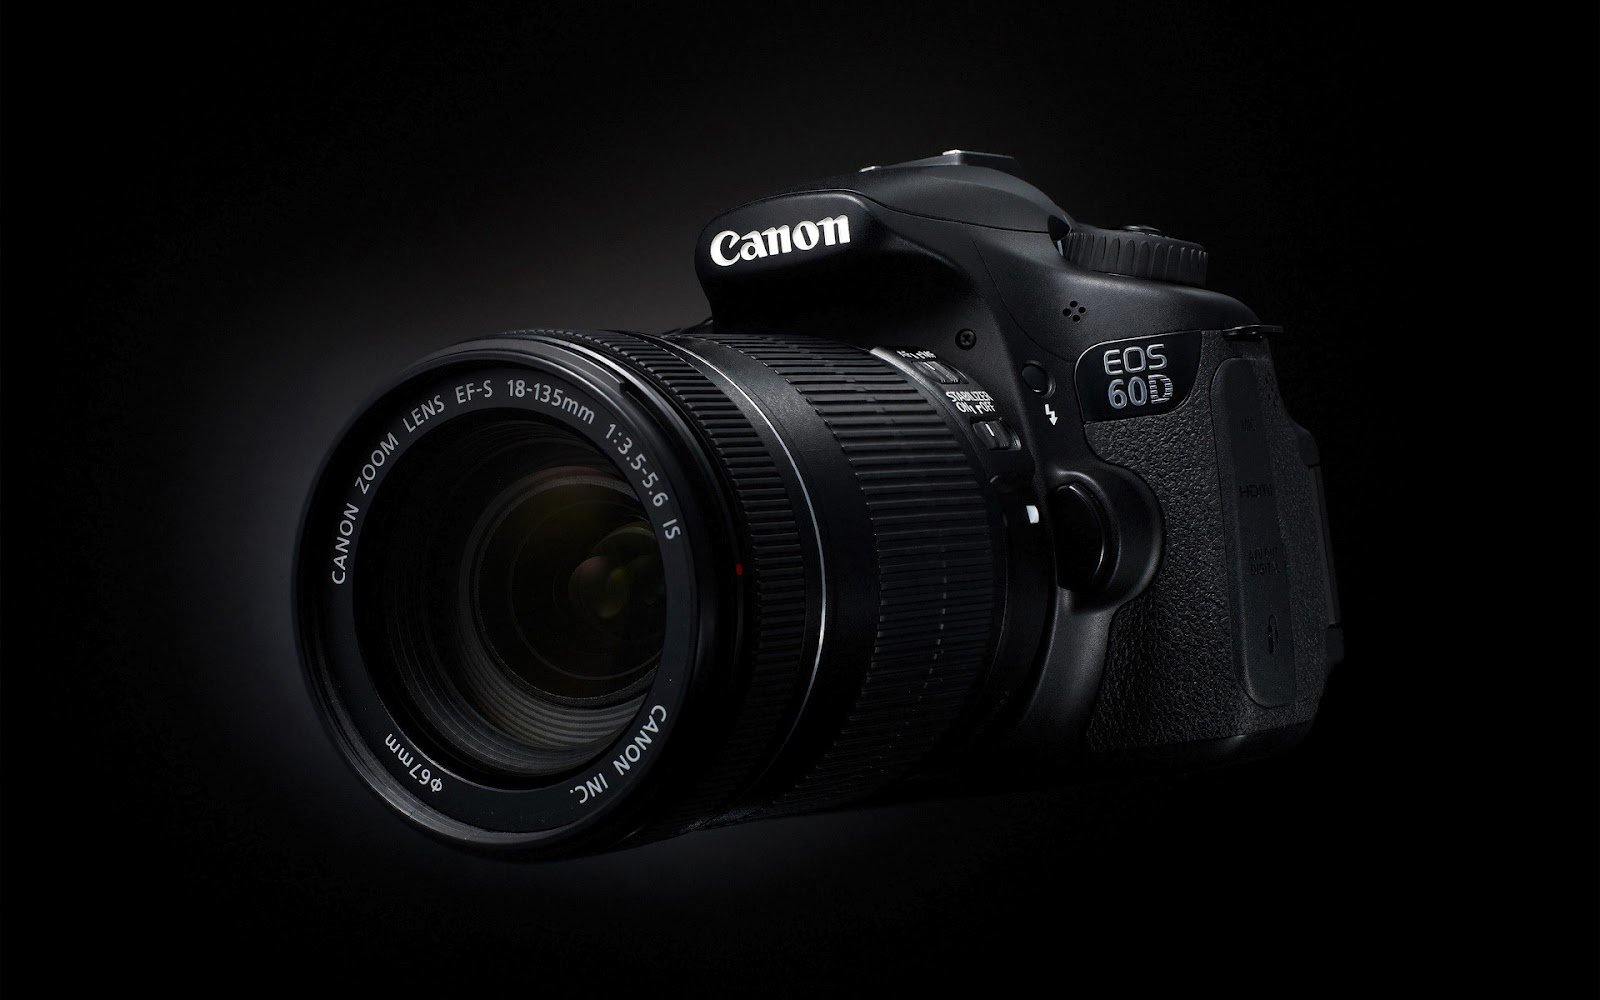 Canon EOS 60D HD Wallpaper is a Beautiful Wallpaper for your Desktop 1600x1000